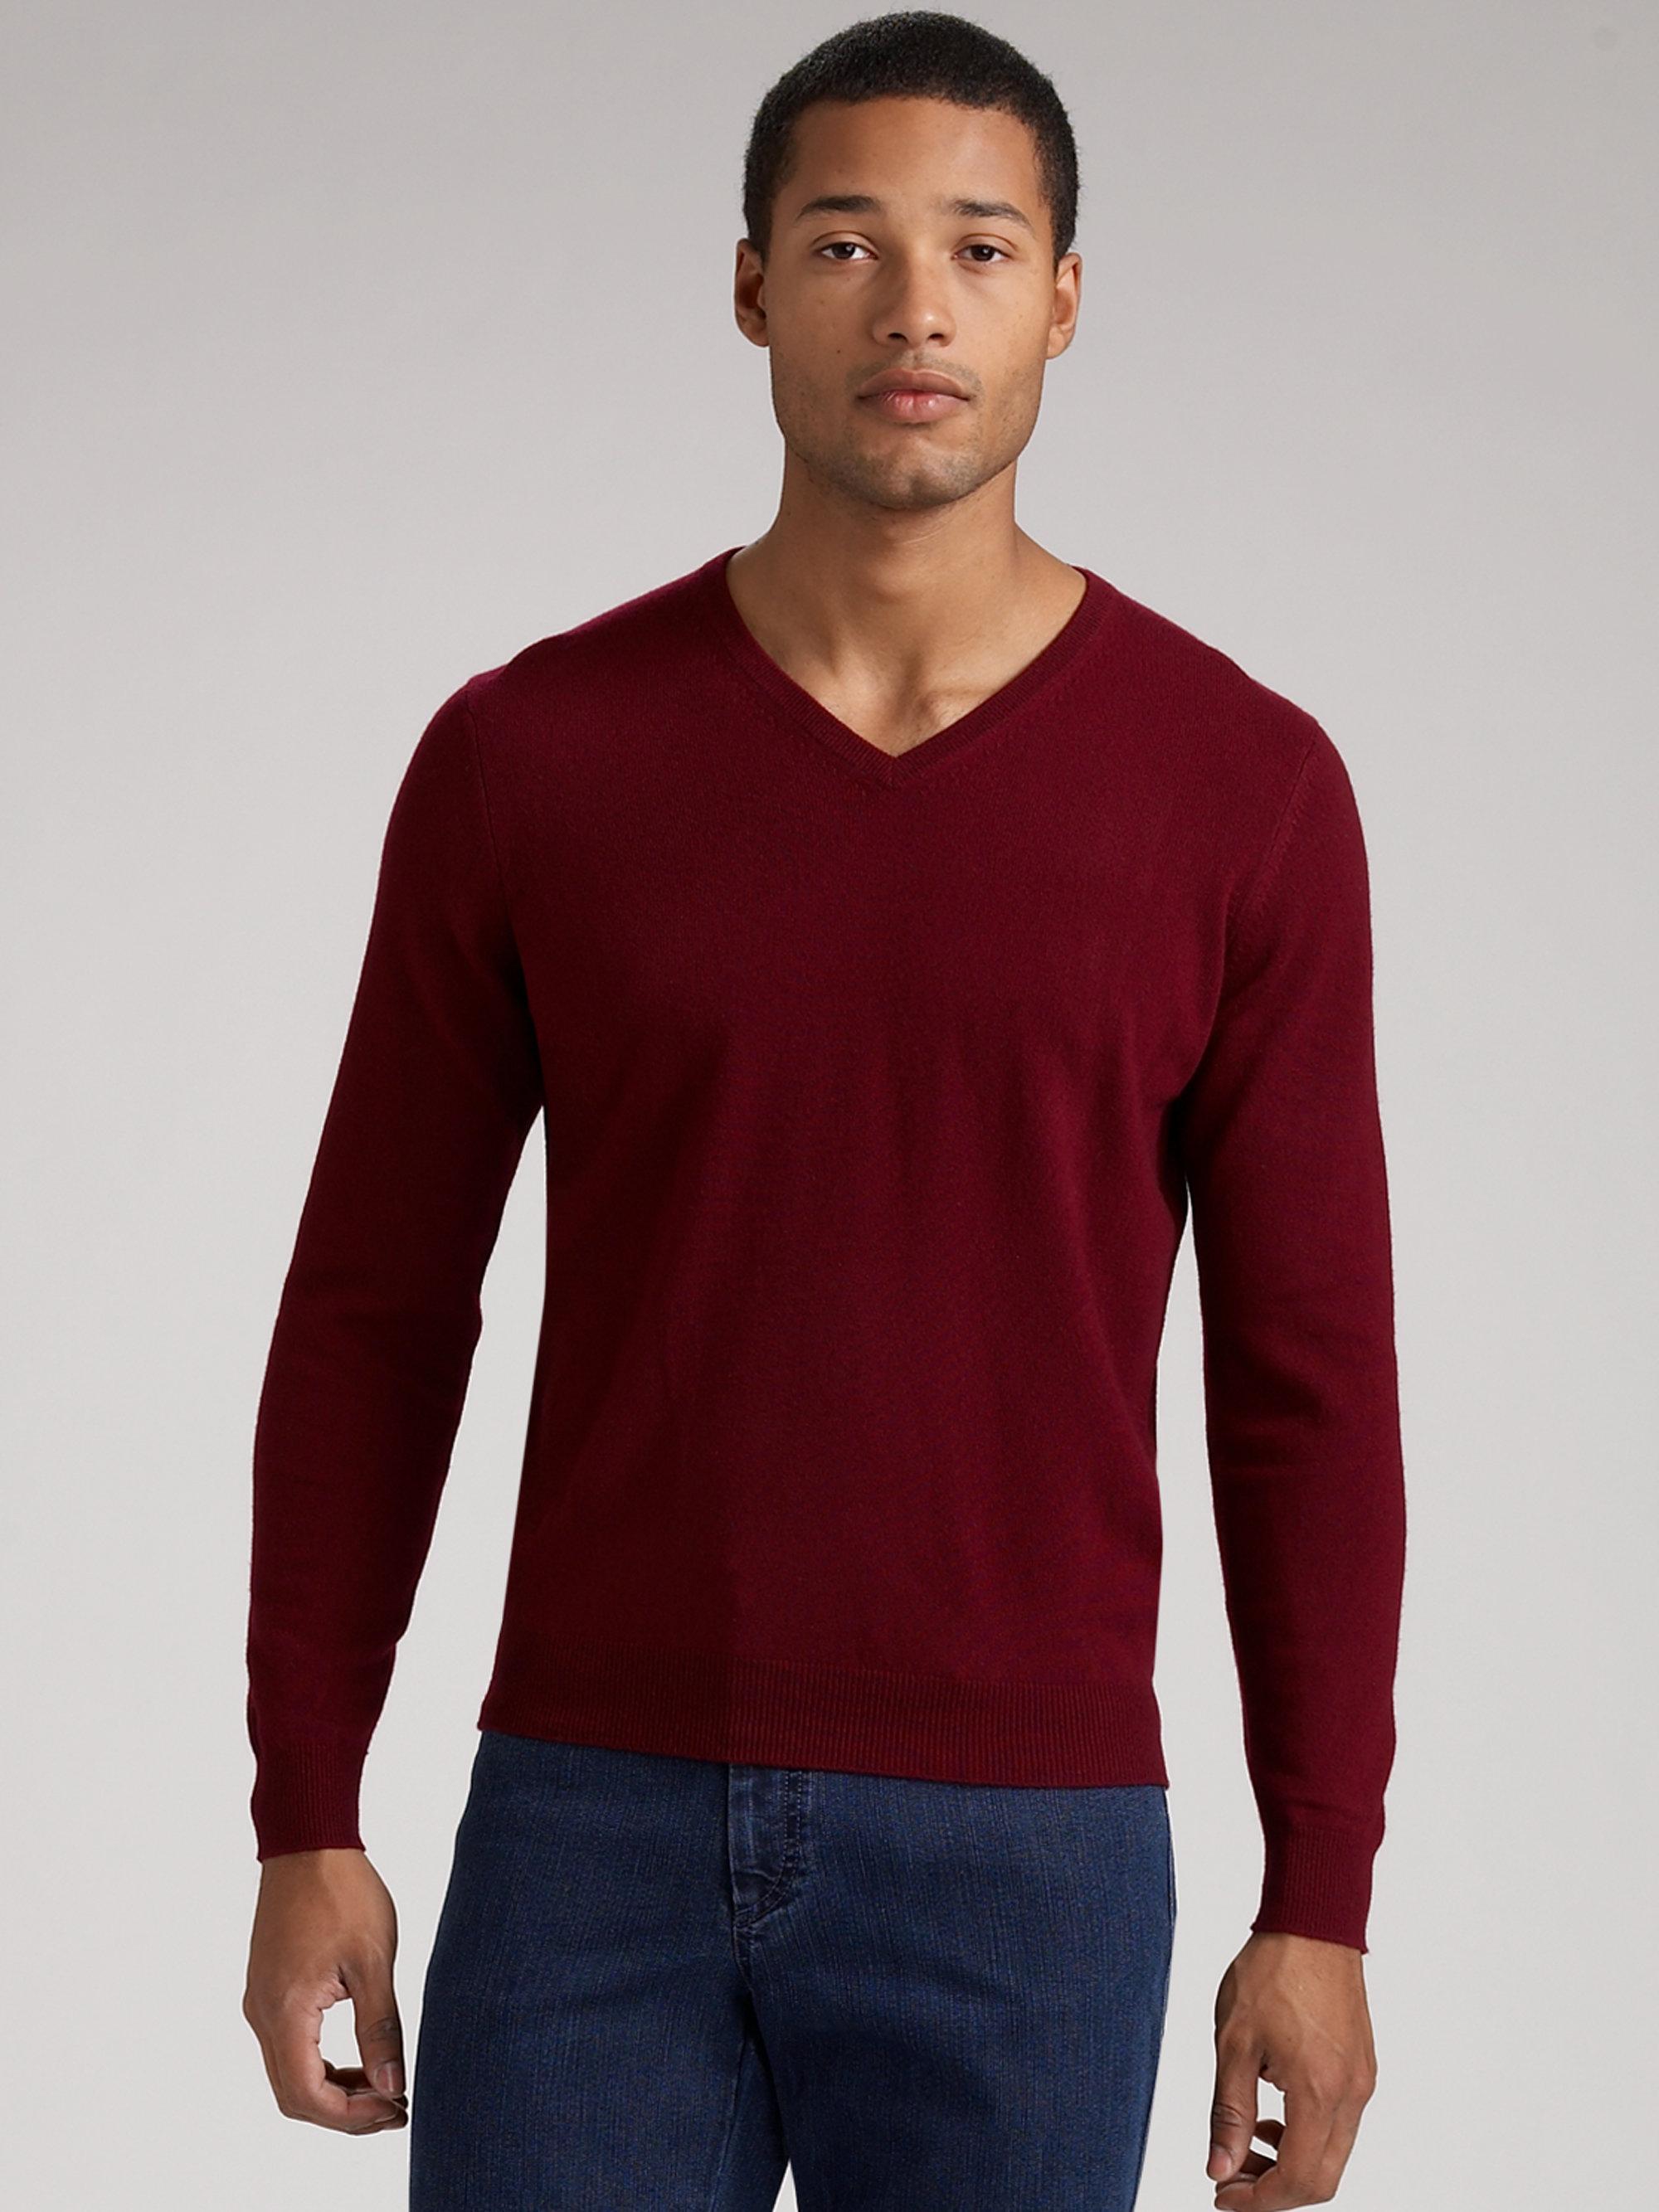 V Neck Sweater Dress Shirt 44